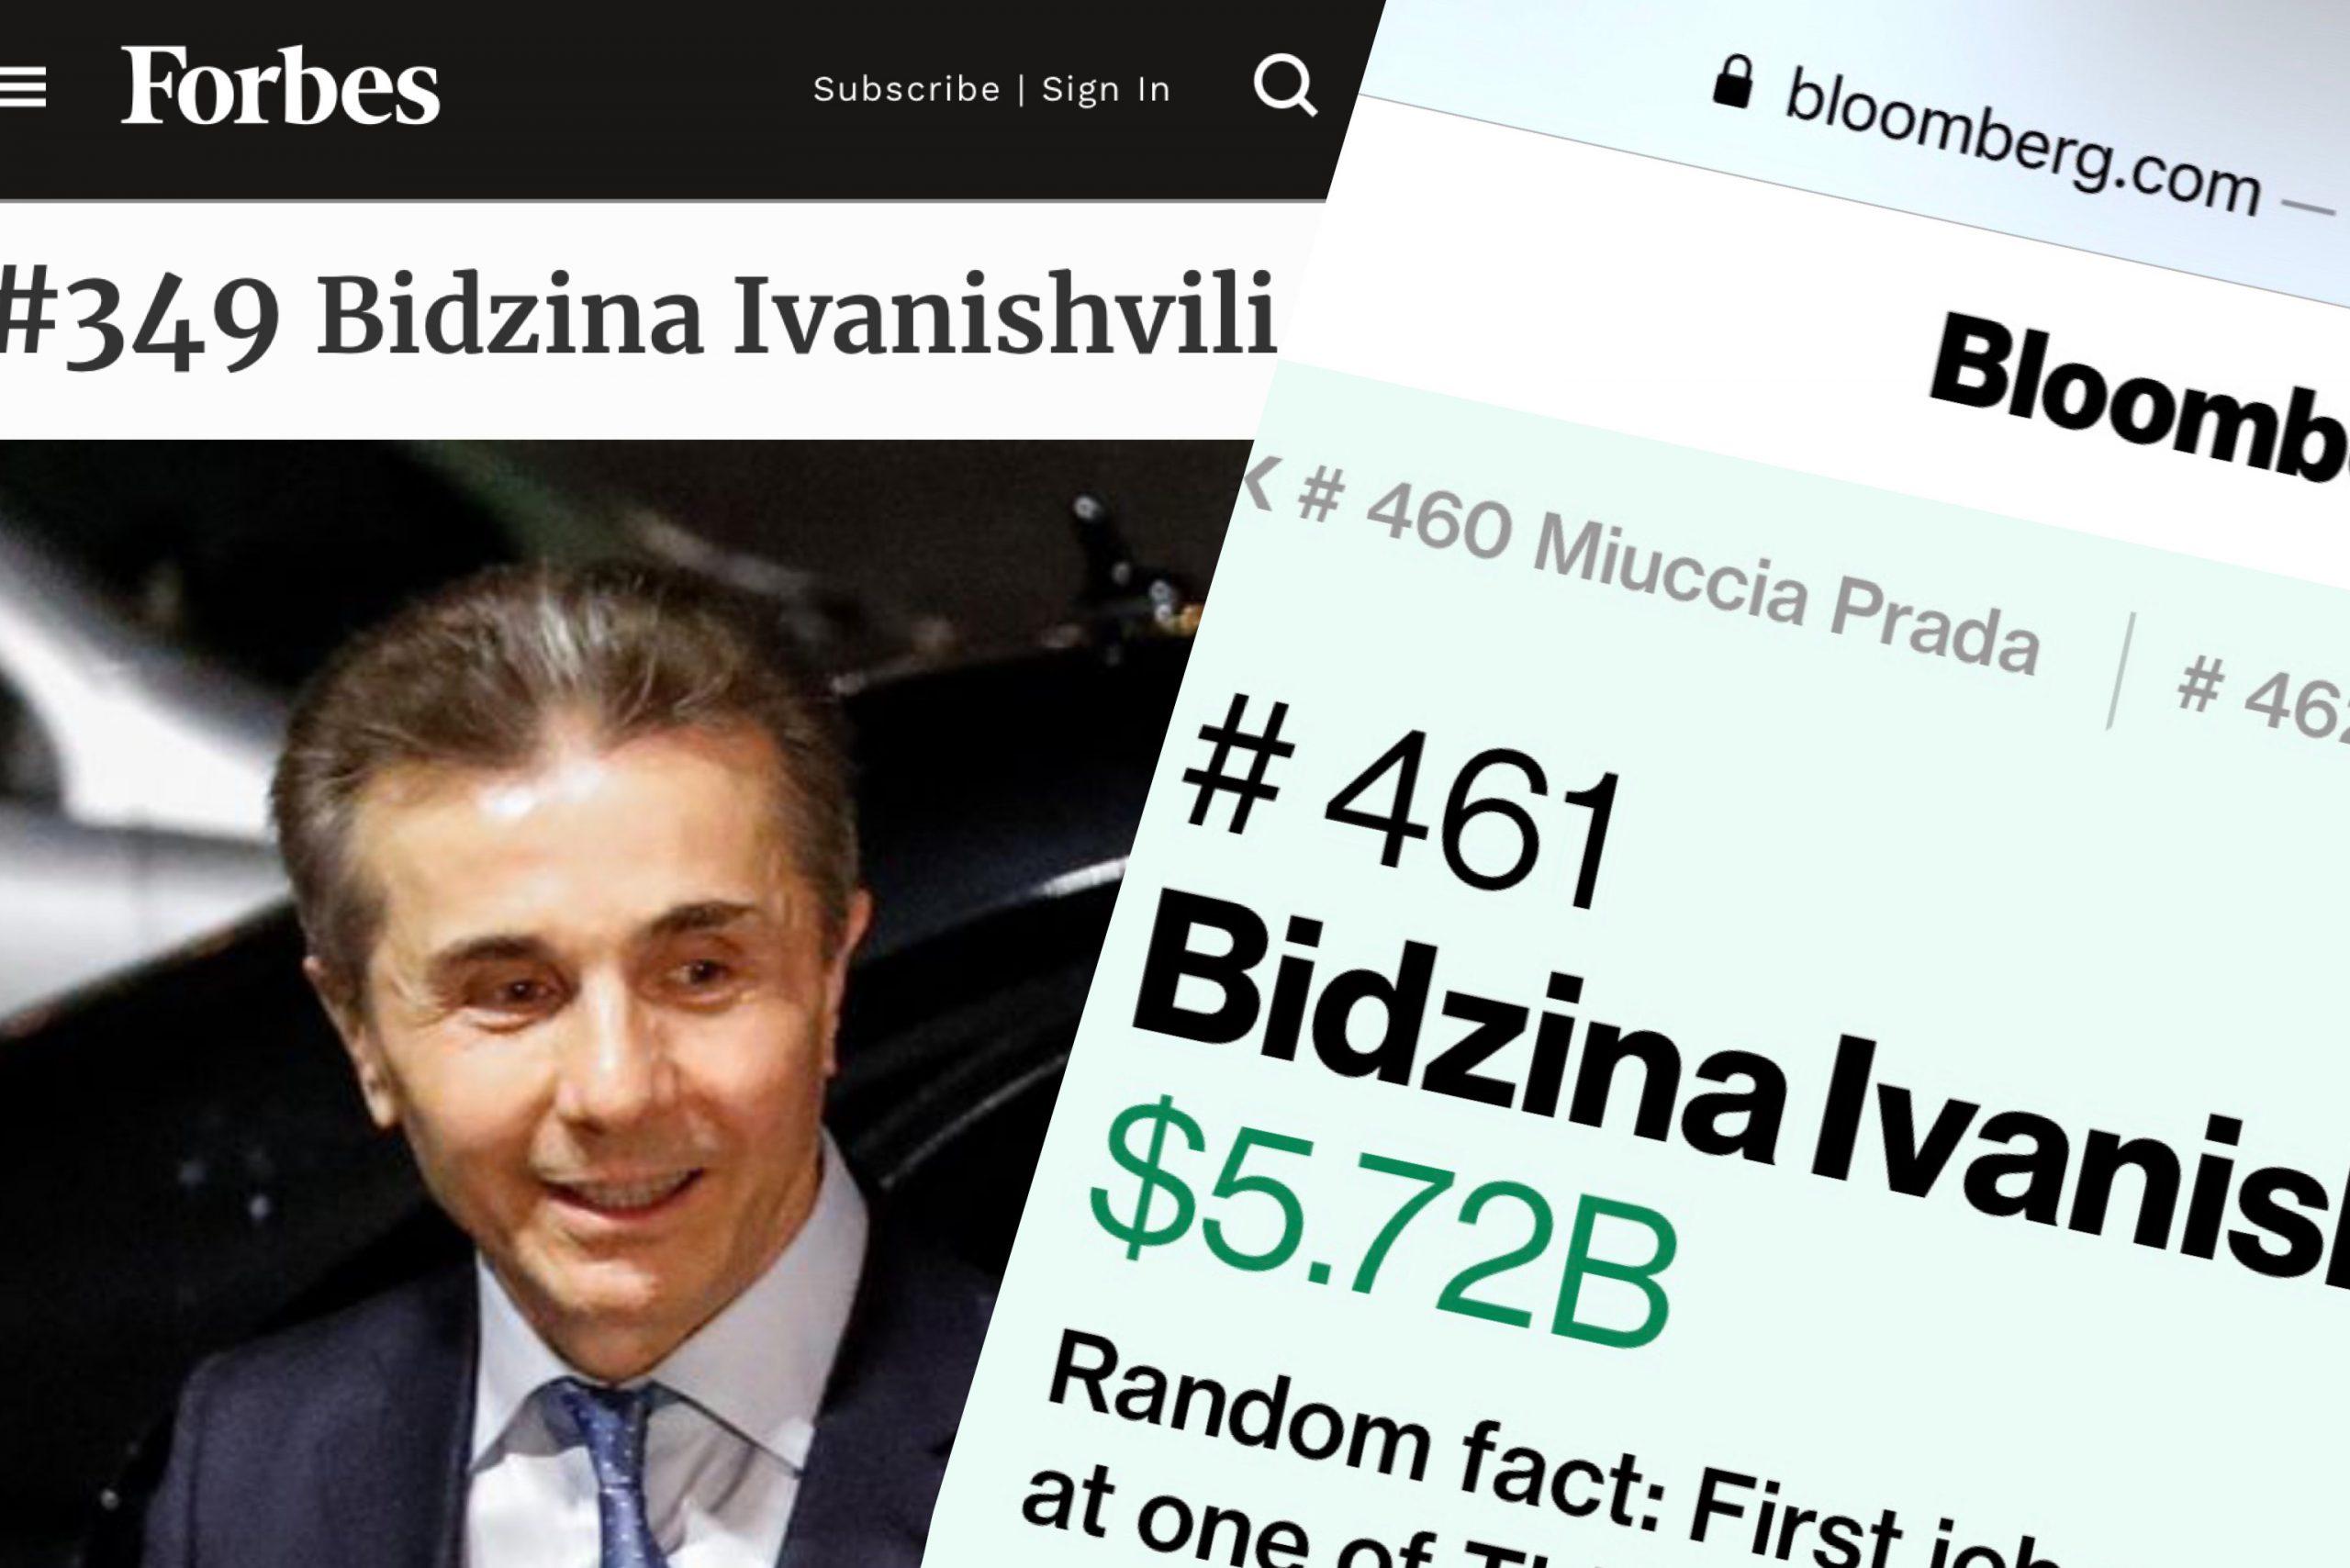 CEFC8FFF BB14 4E29 B9C1 1CEC0501DF51 scaled #политика Bloomberg, featured, Forbes, Бидзина Иванишвили, Форбс